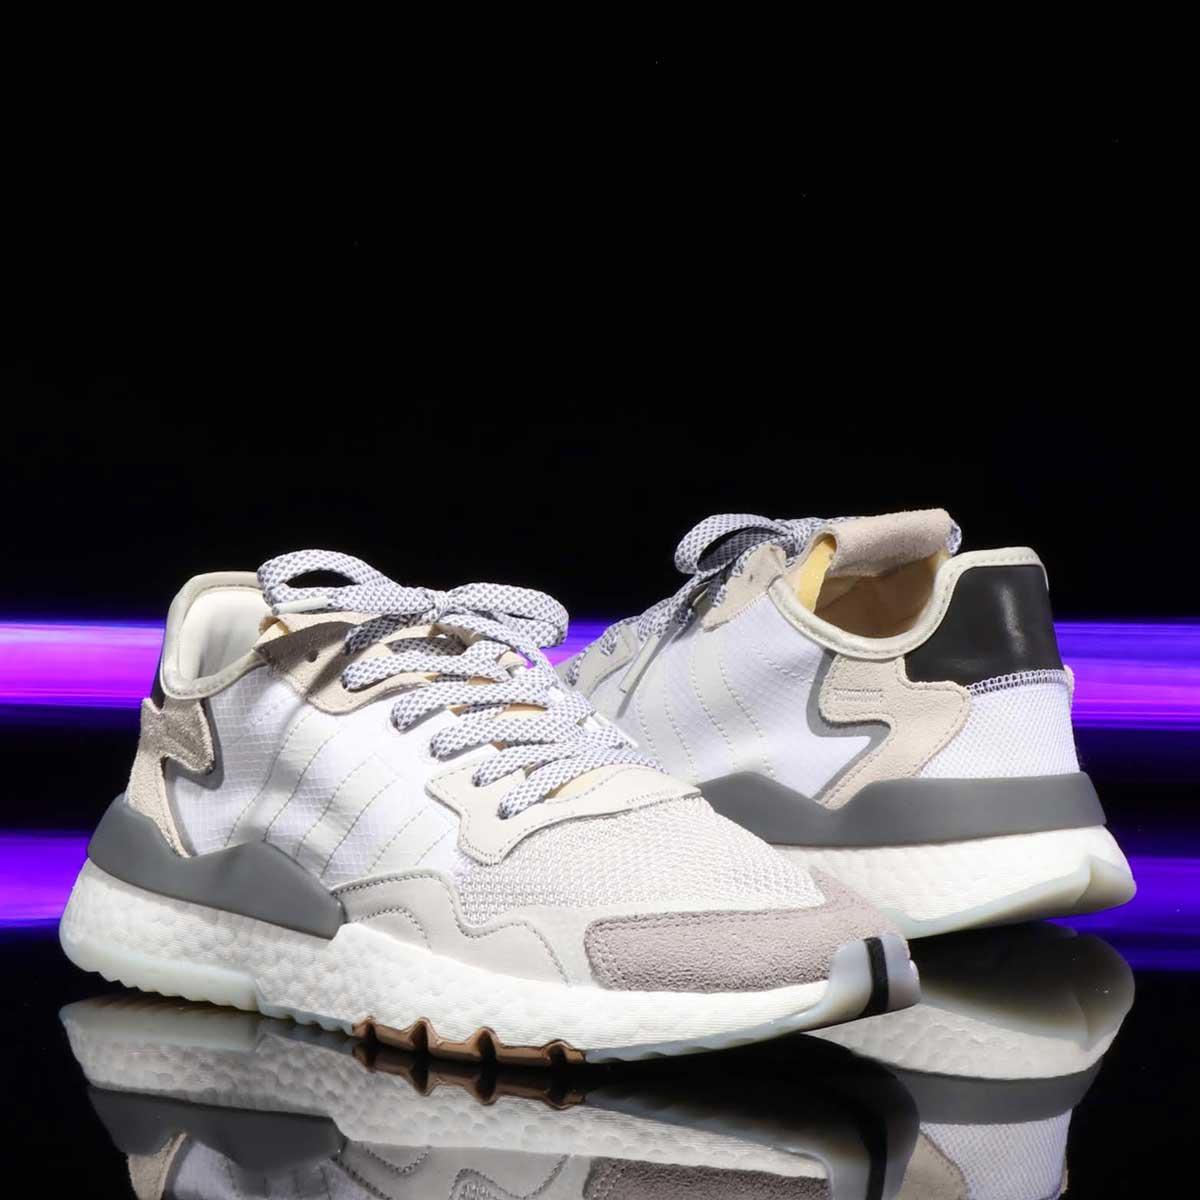 adidas Originals NITE JOGGER(アディダスオリジナルス ナイト ジョガー)RUNNING WHITE/CRYSTAL WHITE/CORE BLACK【メンズ レディース スニーカー】19SS-I